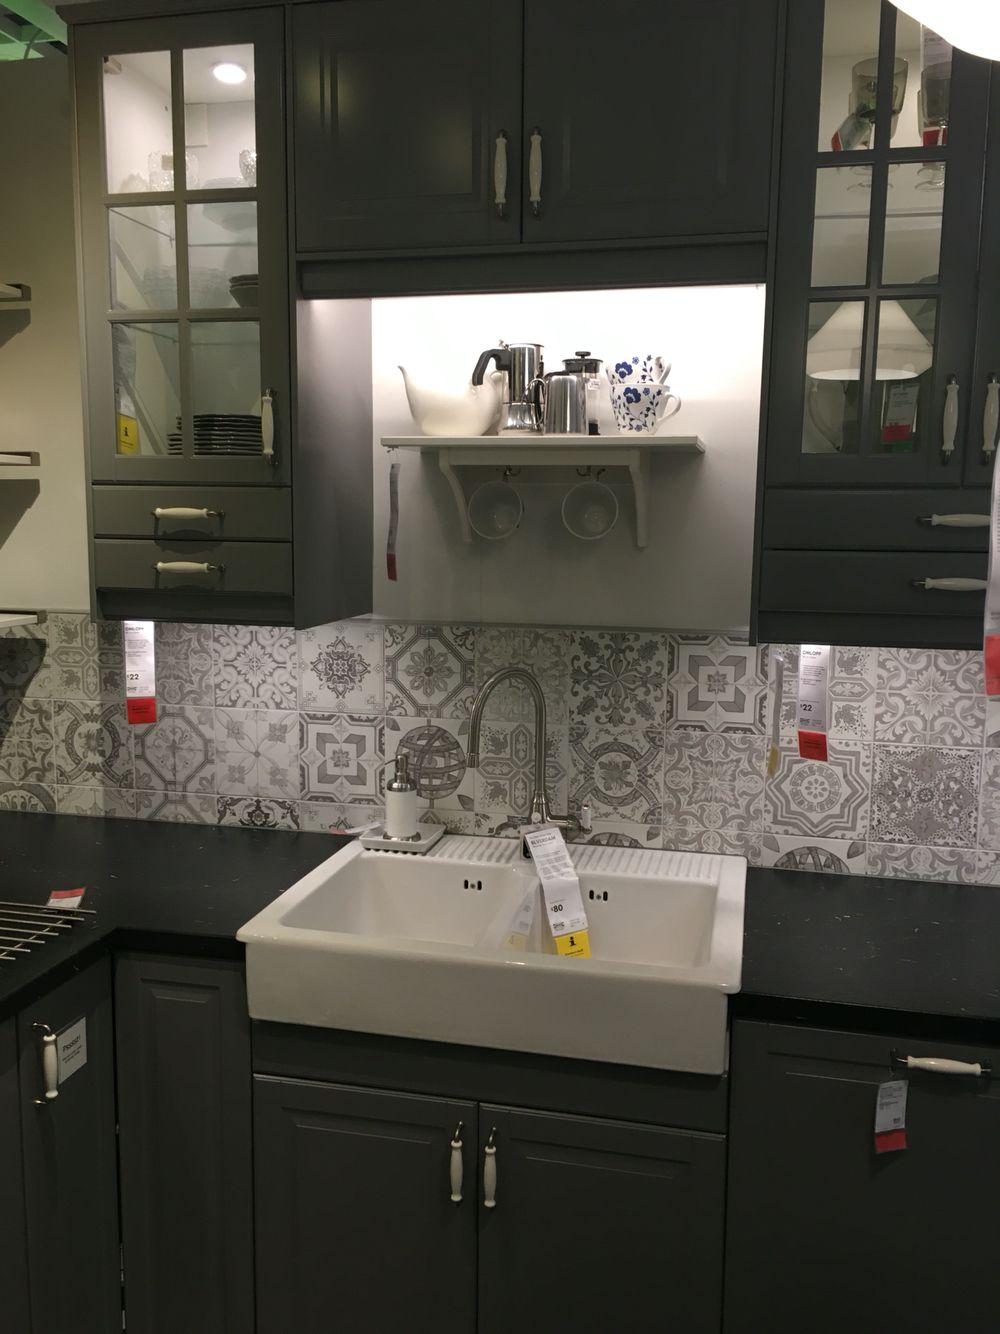 IKEA bodbyn kitchen with nikea style tiles | Cucine nere | Pinterest ...